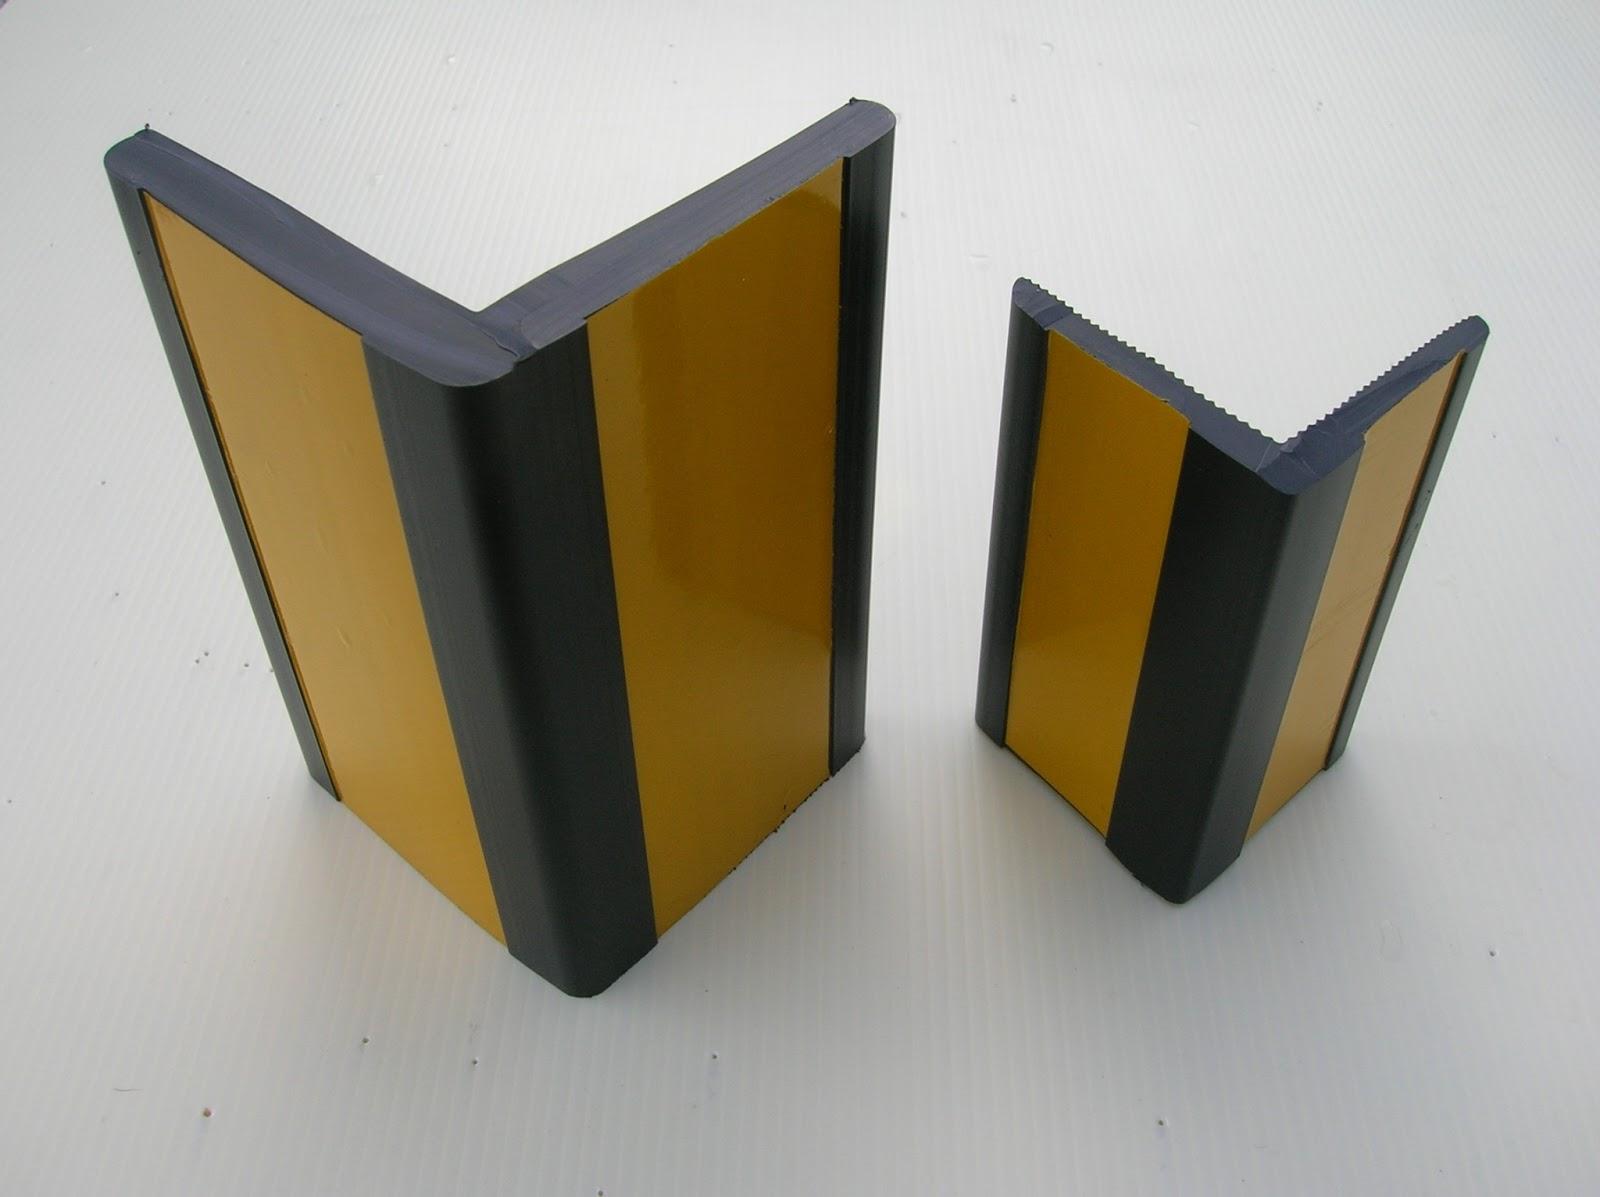 http://4.bp.blogspot.com/-8bD-bDa74Pw/T5u8OW2AA6I/AAAAAAAABDk/CxNMUmXD9OA/s1600/Flexijoint+Corner+Guard+cw+reflector+%25282%2529.JPG